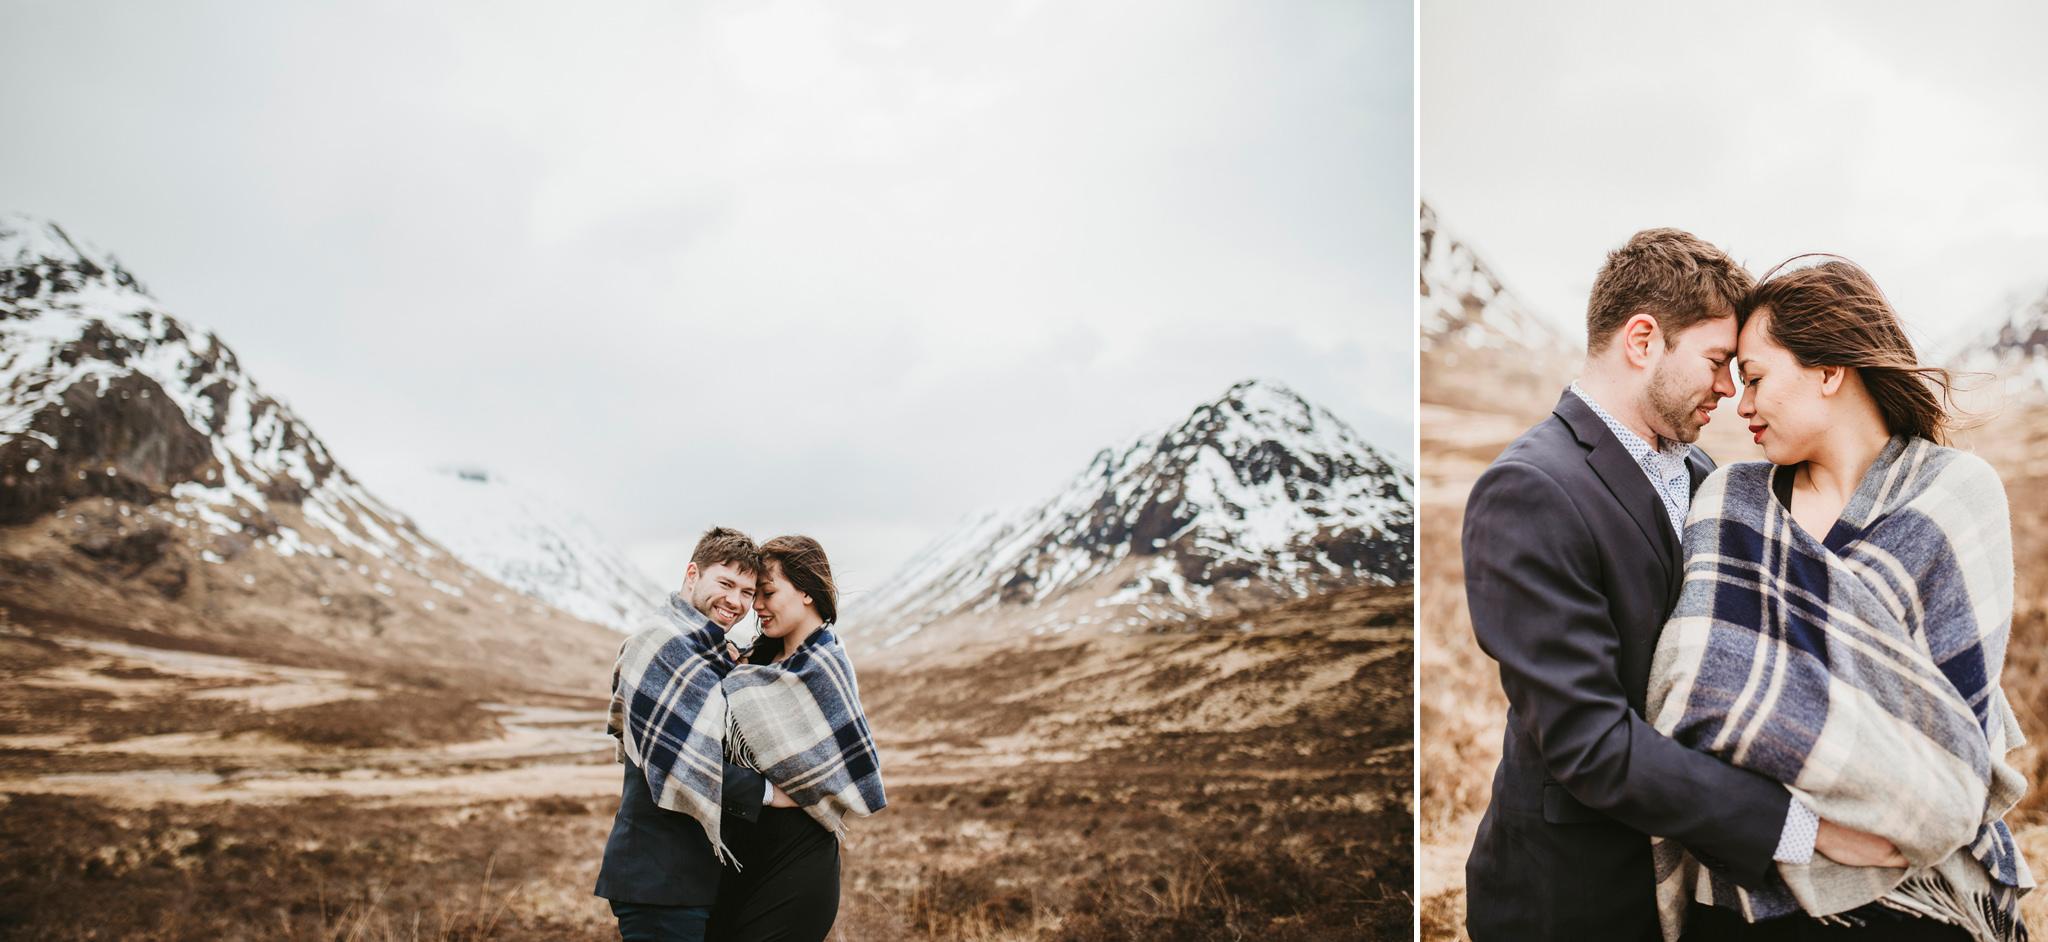 21-glencoe-scottish-highlands-wedding-photographer.jpg